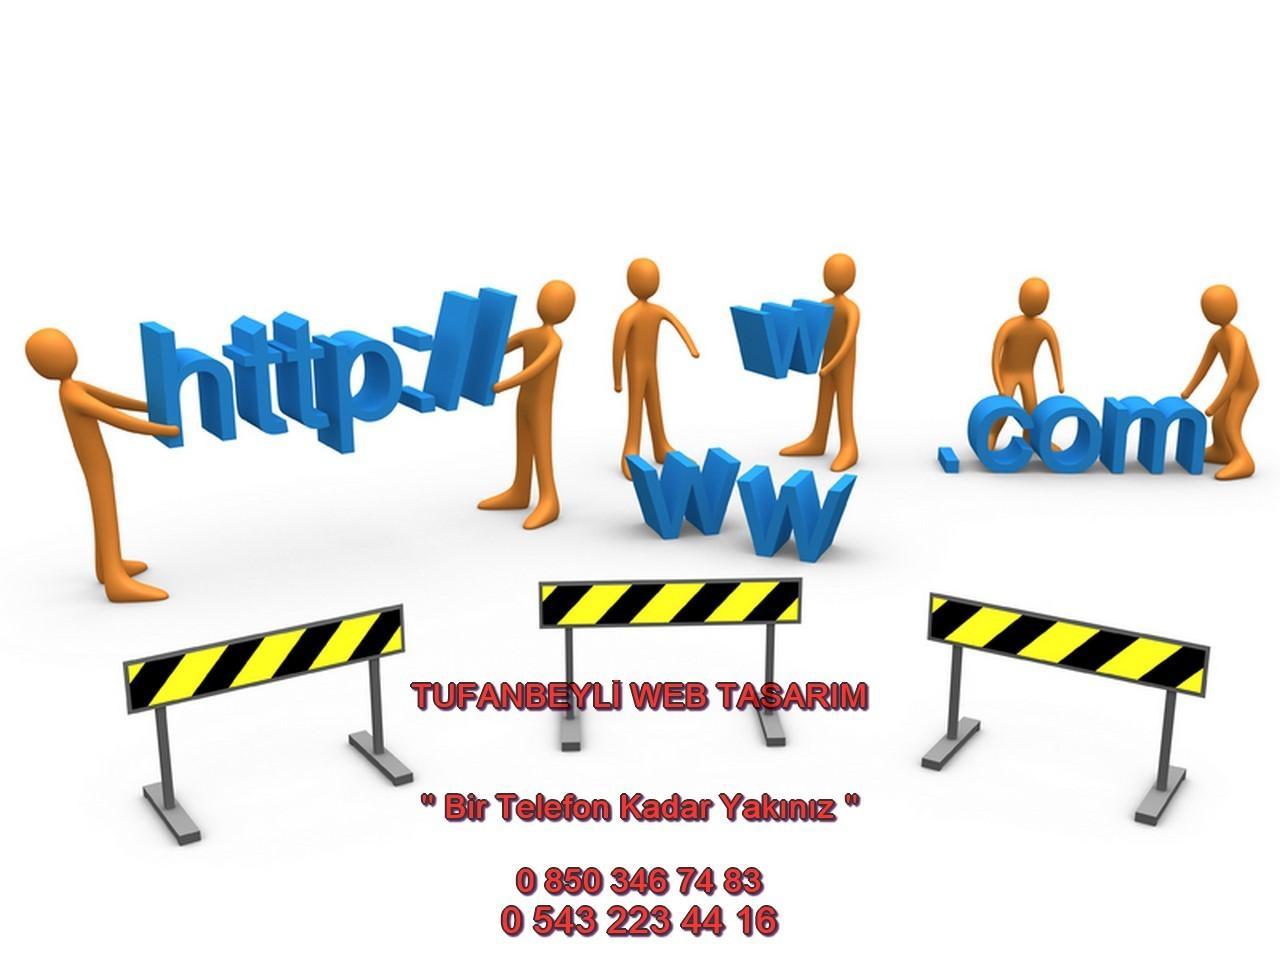 Tufanbeyli Web Tasarım